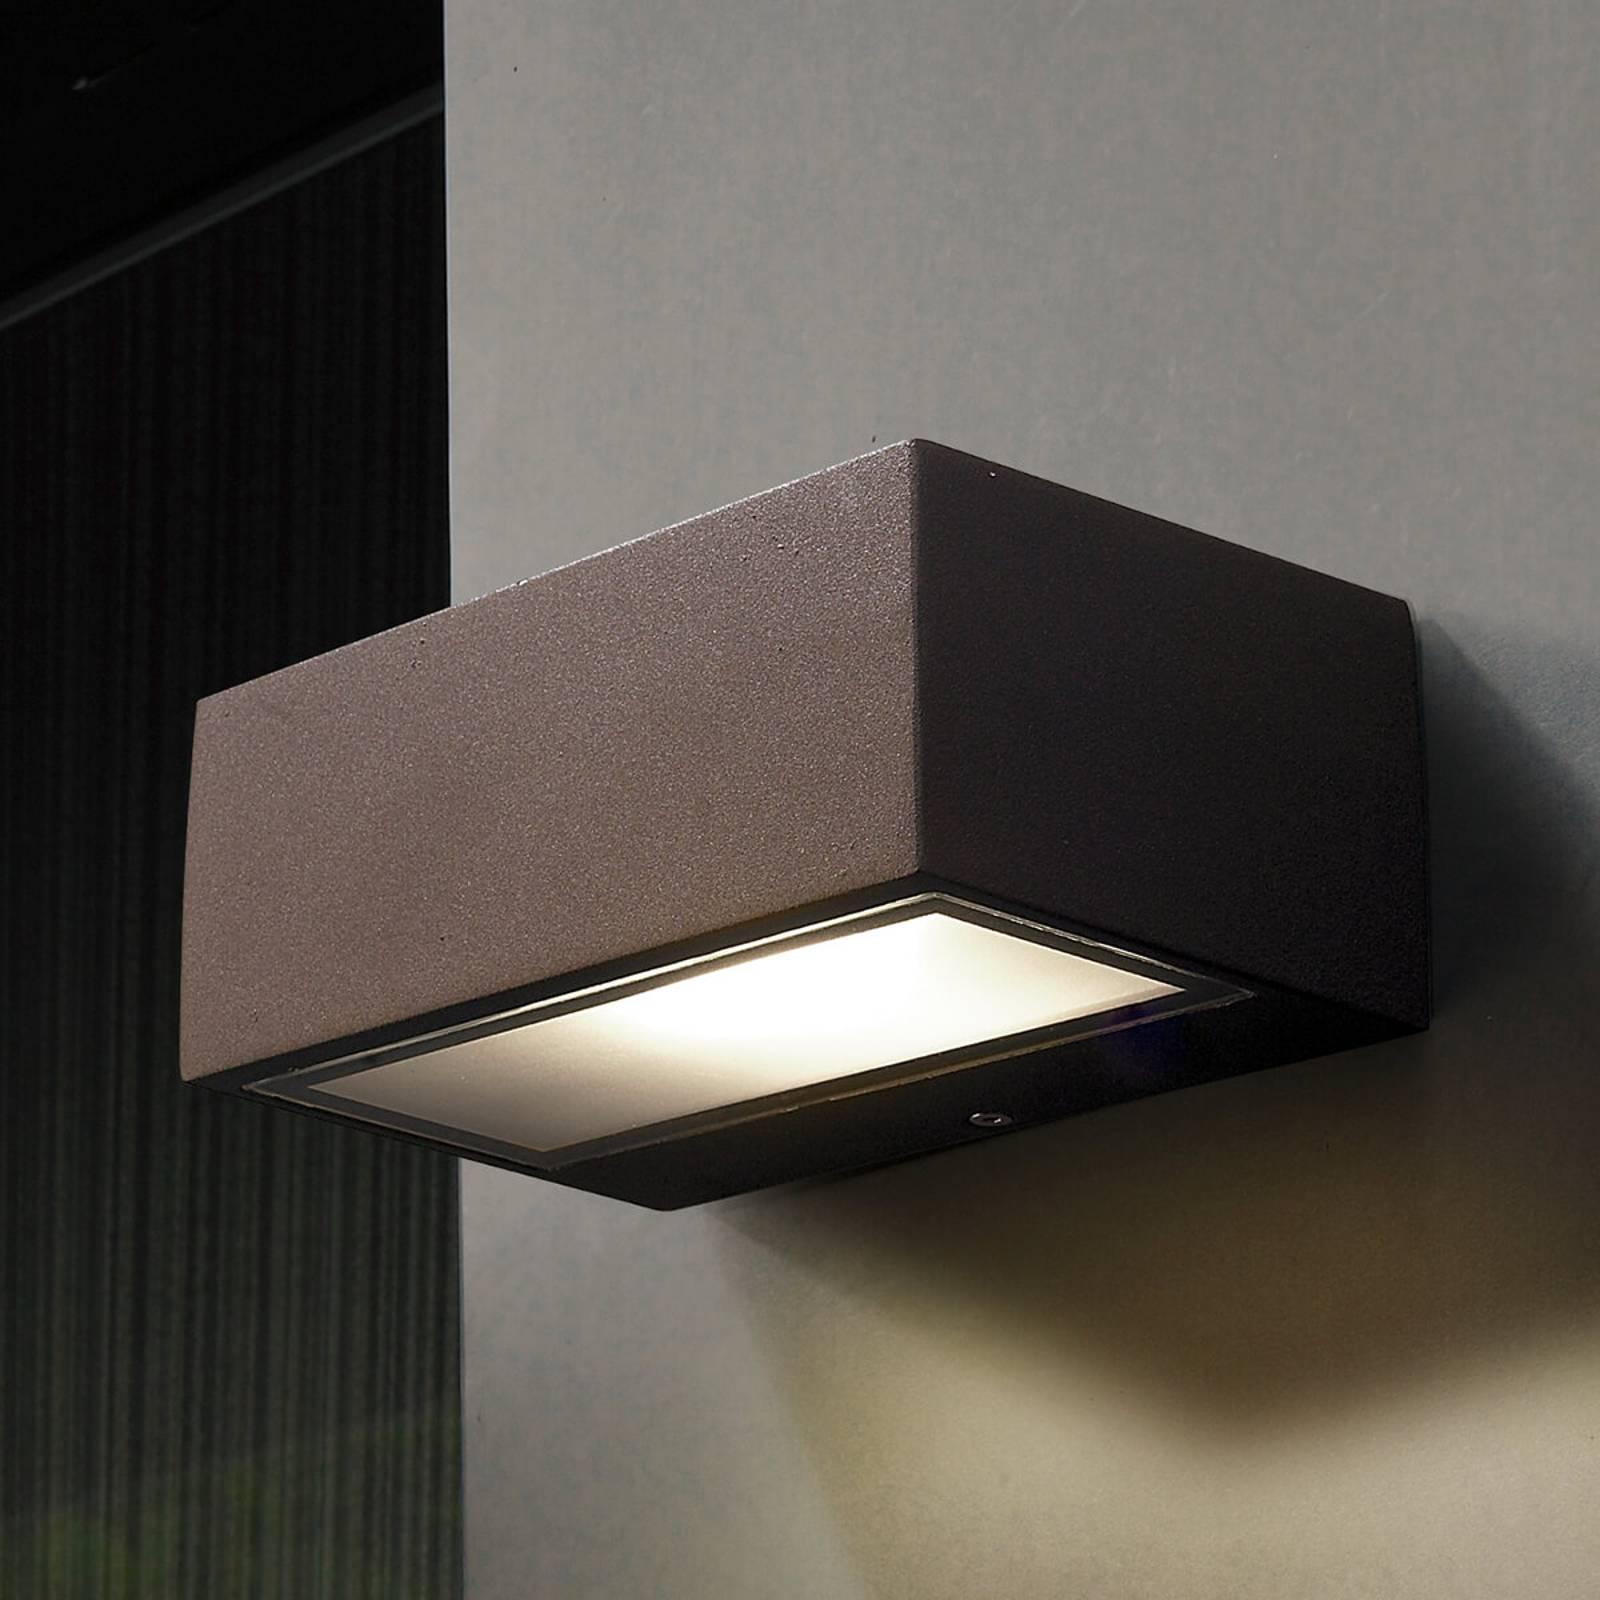 LED-buitenwandlamp Nemesis, bruin